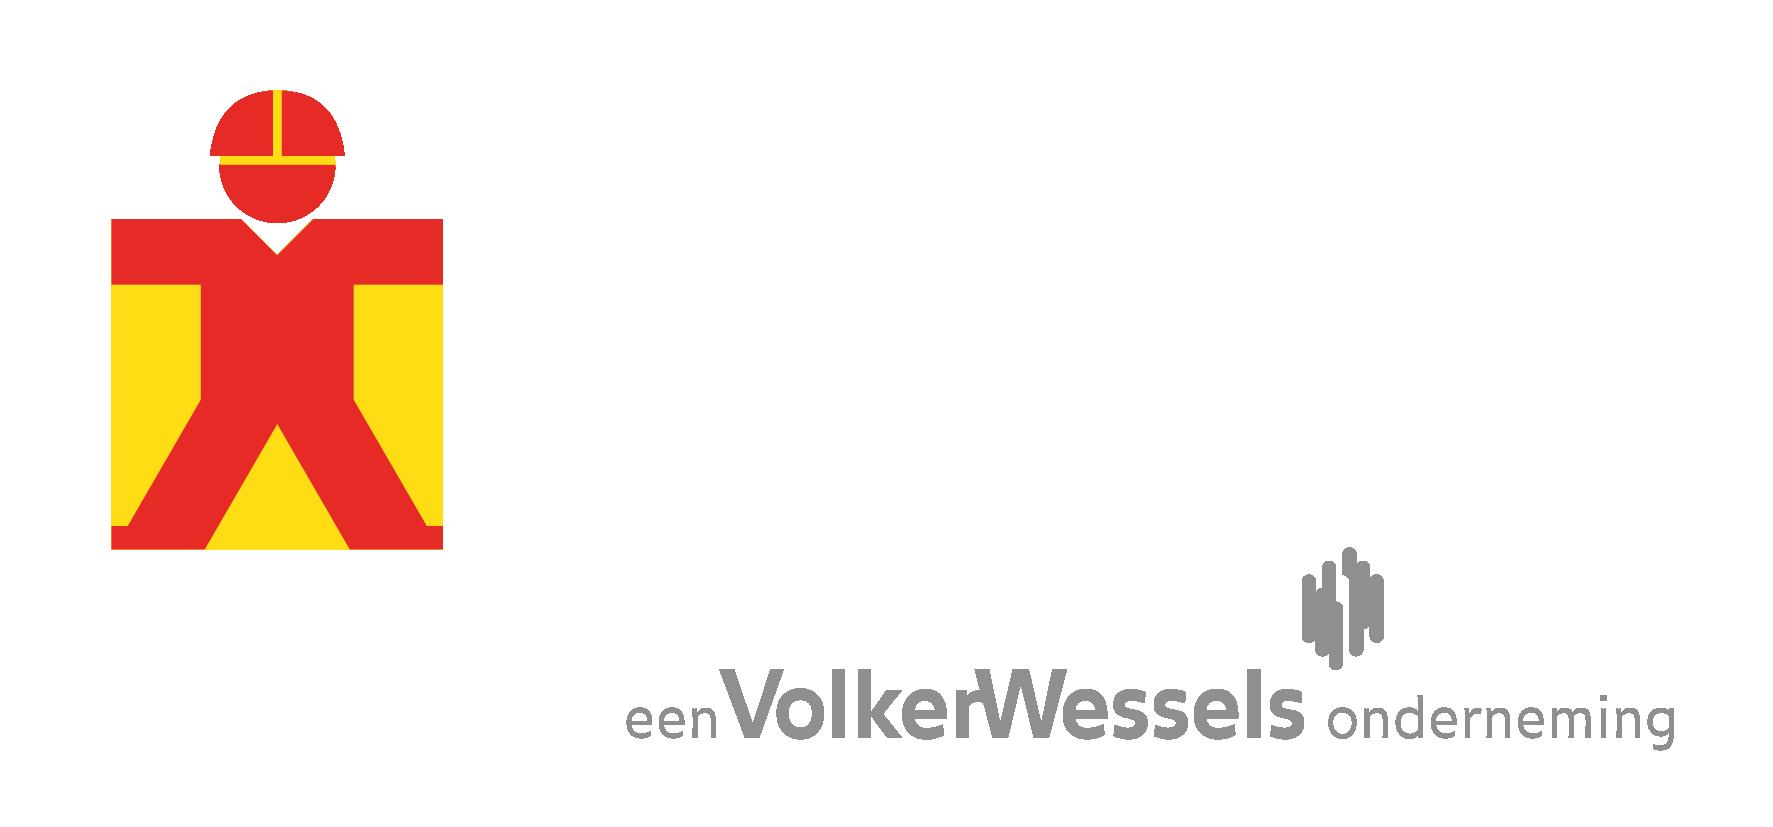 AGT1_VanAgtmaal_VW_Logo-01.png